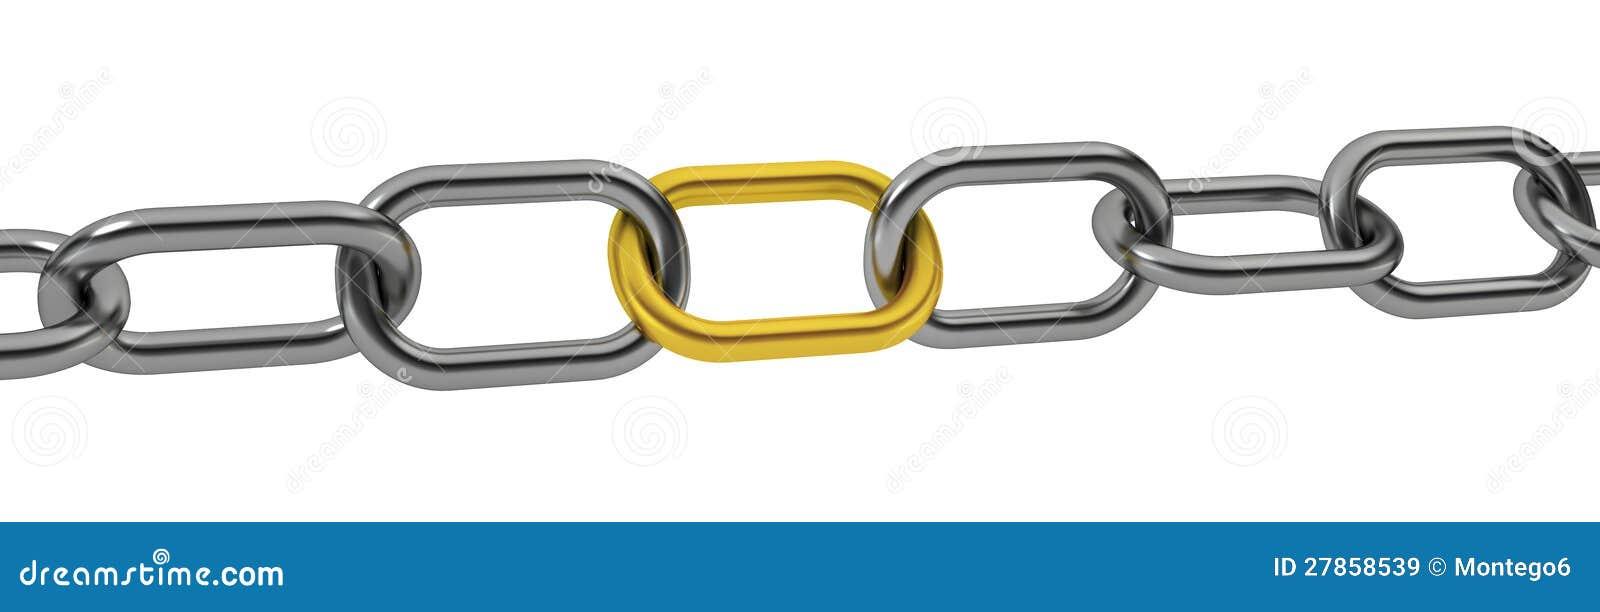 Unikalny łańcuch